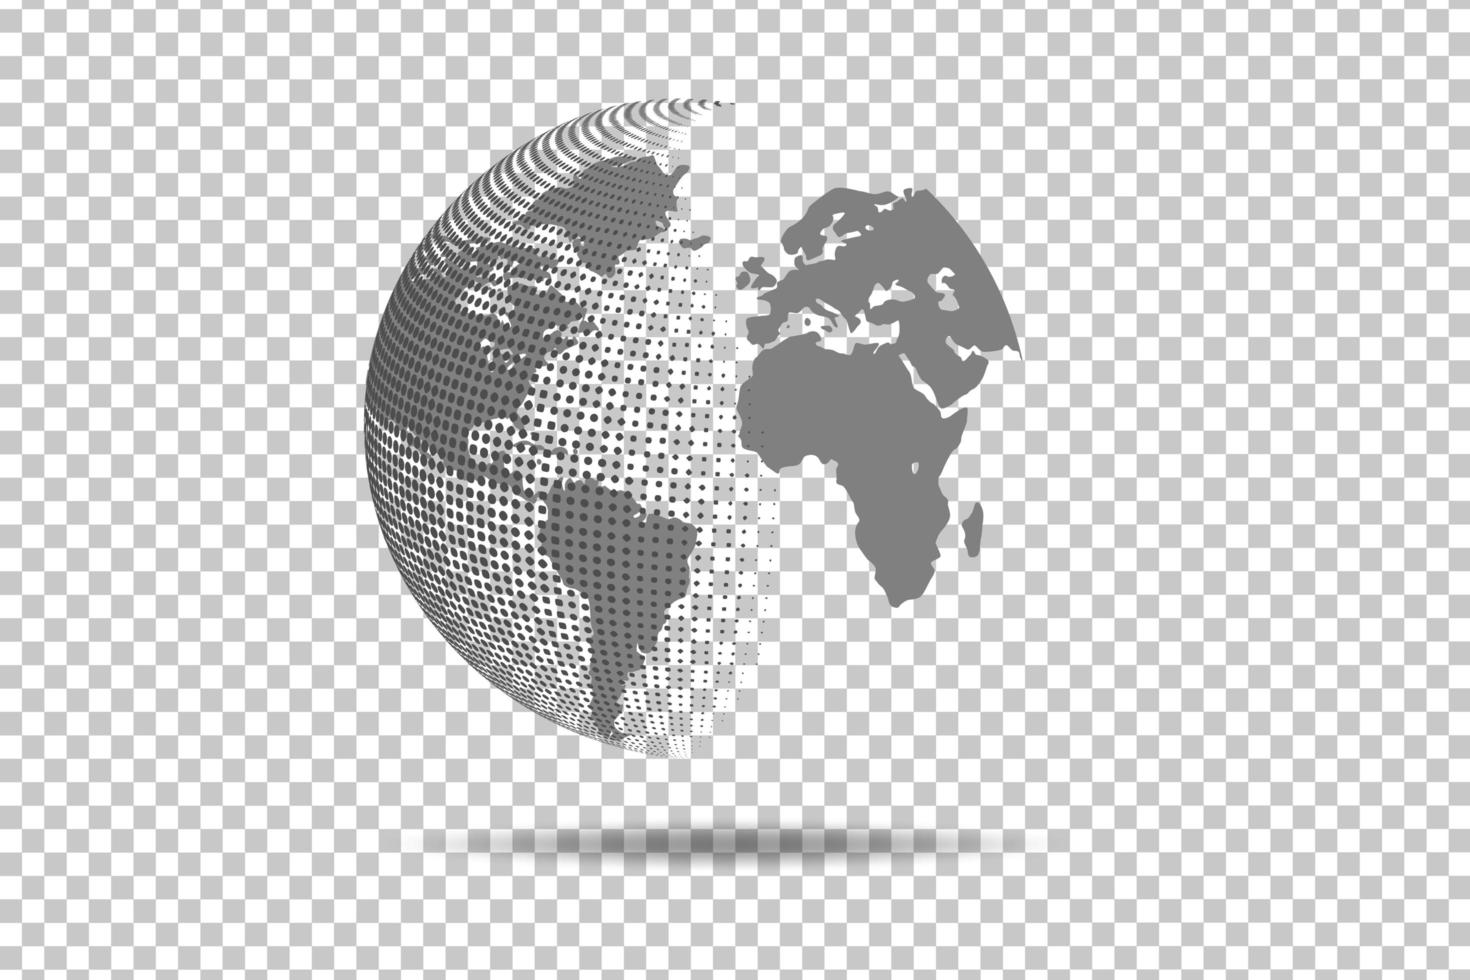 abstrakte Weltkarte globale Netzwerkverbindung vektor